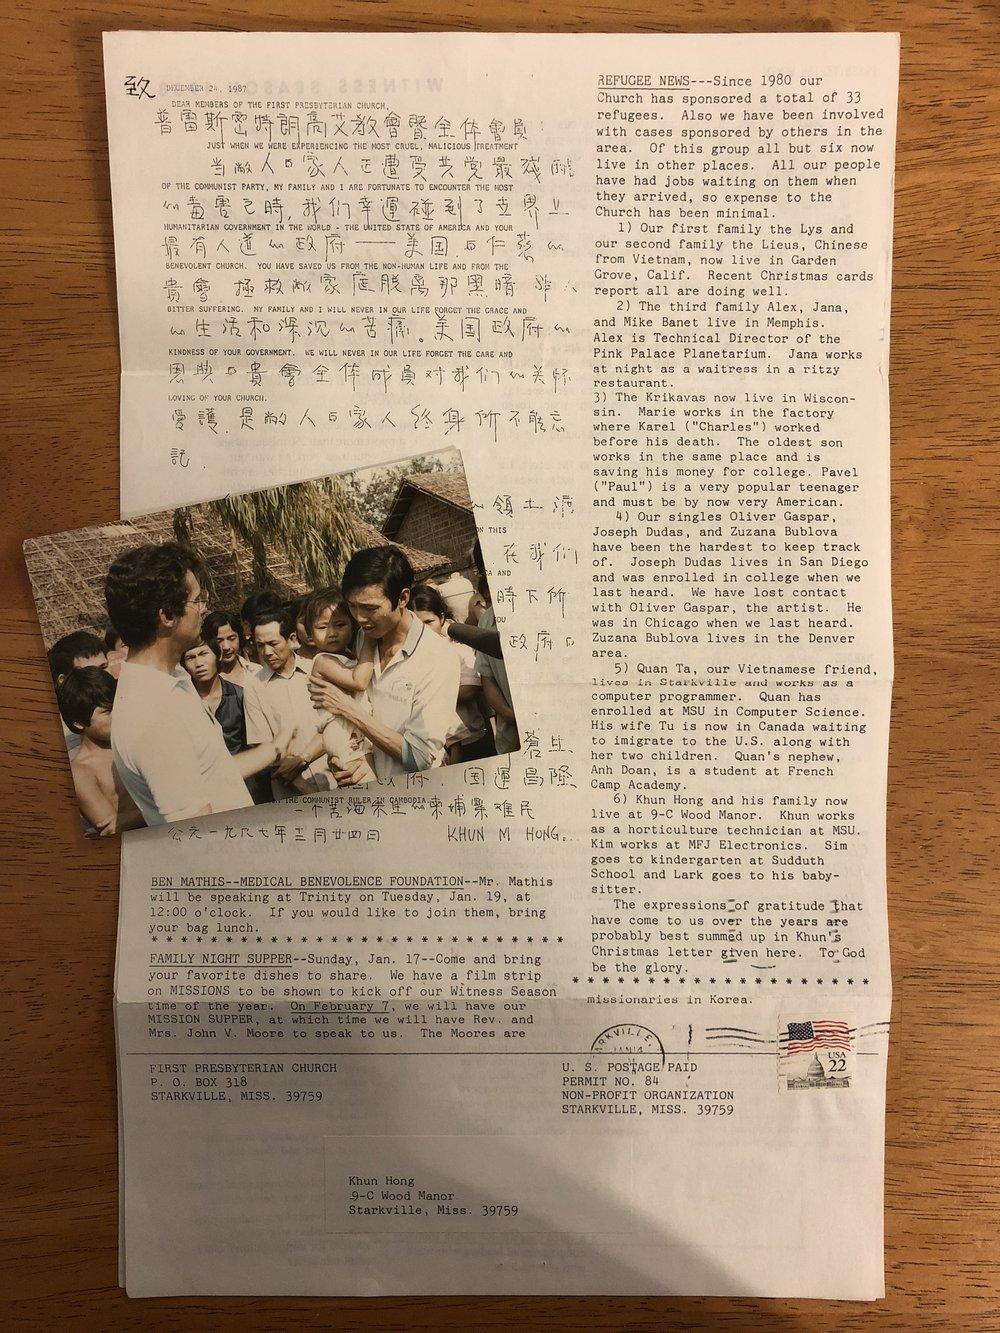 Letter to First Presbyterian Church from Khun Hong, December 1987